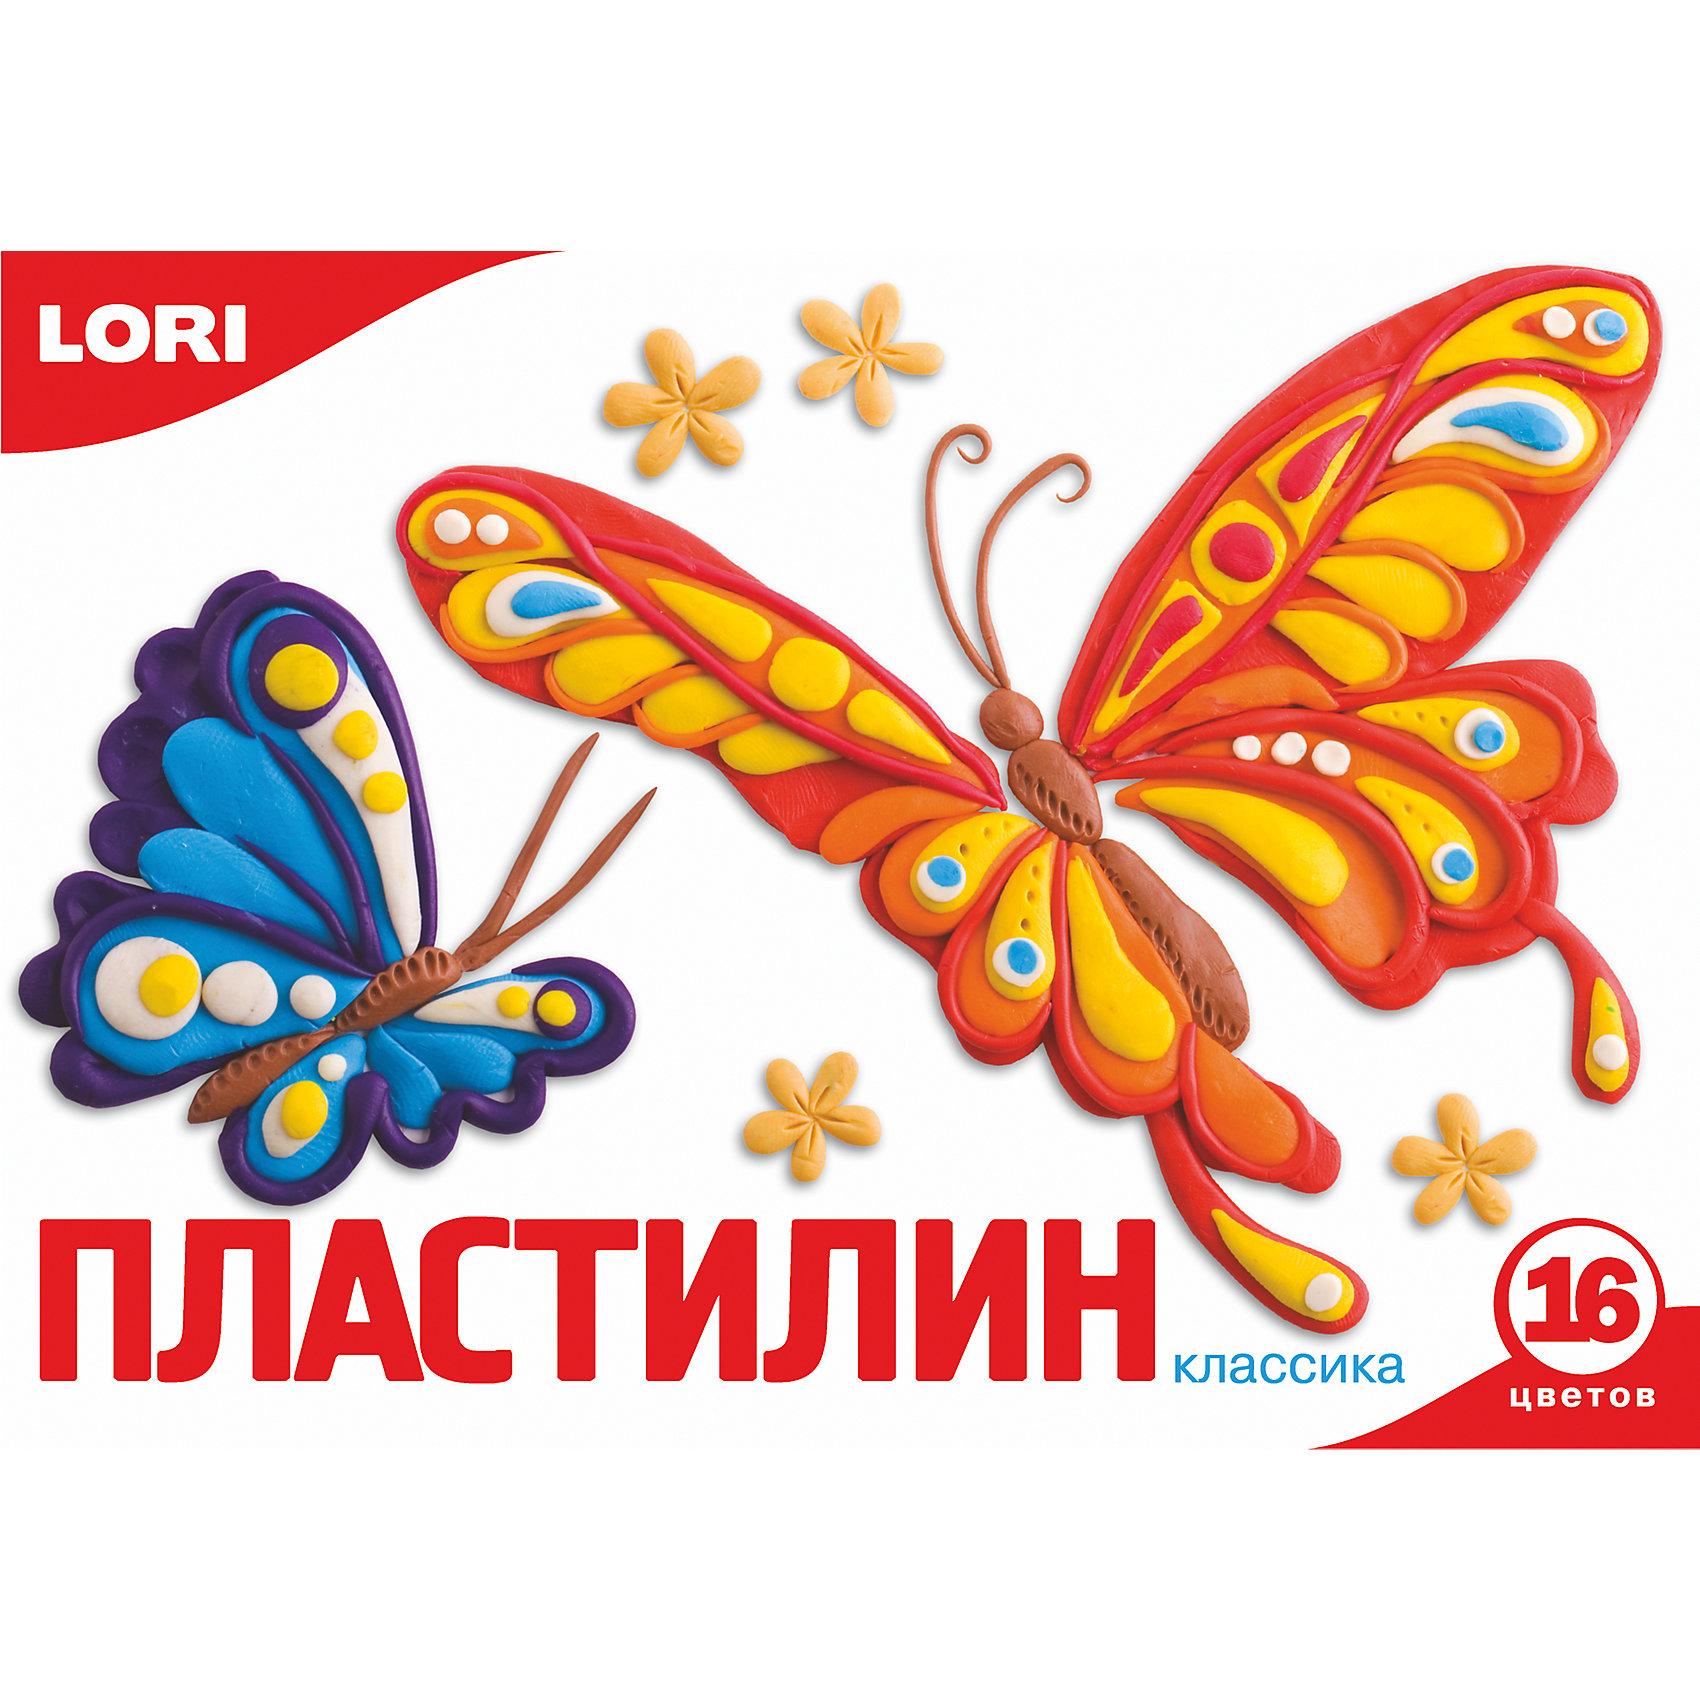 LORI Пластилин «Классика» 16 цветов, 20 г lori пластилин тачки 16 цветов